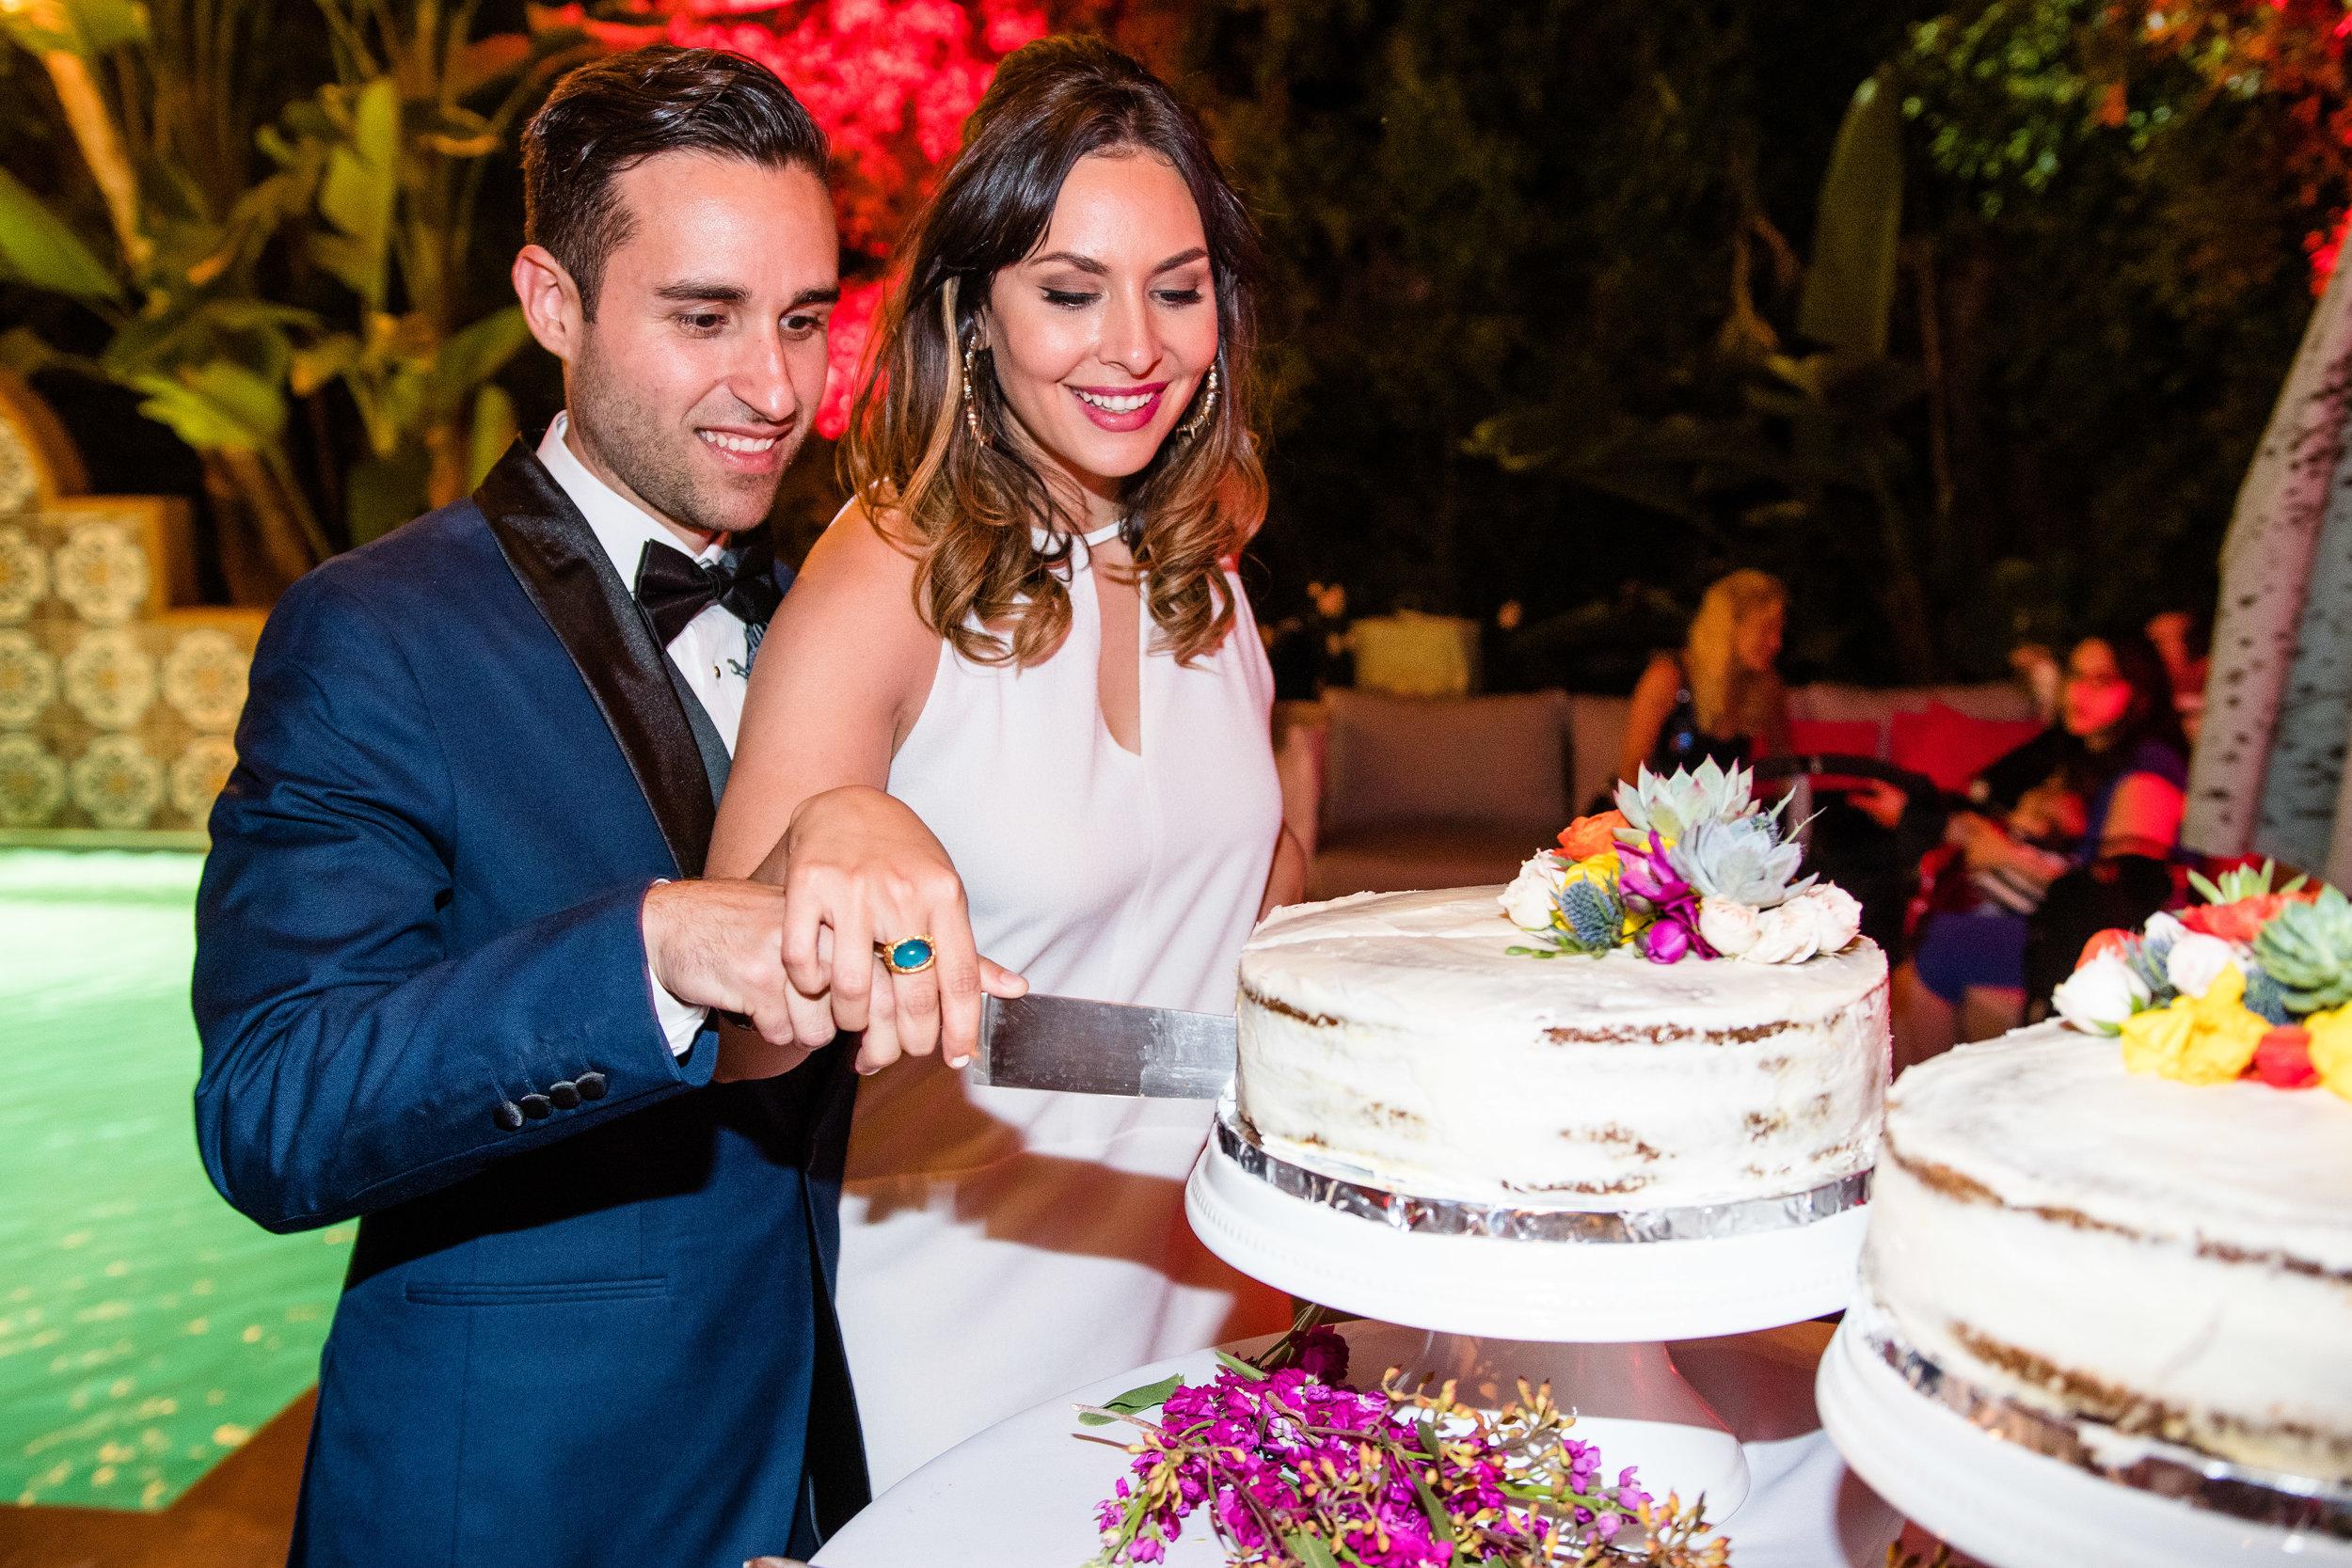 Vibrant Fiesta Backyard Wedding Reception bride and groom cutting cake.jpg